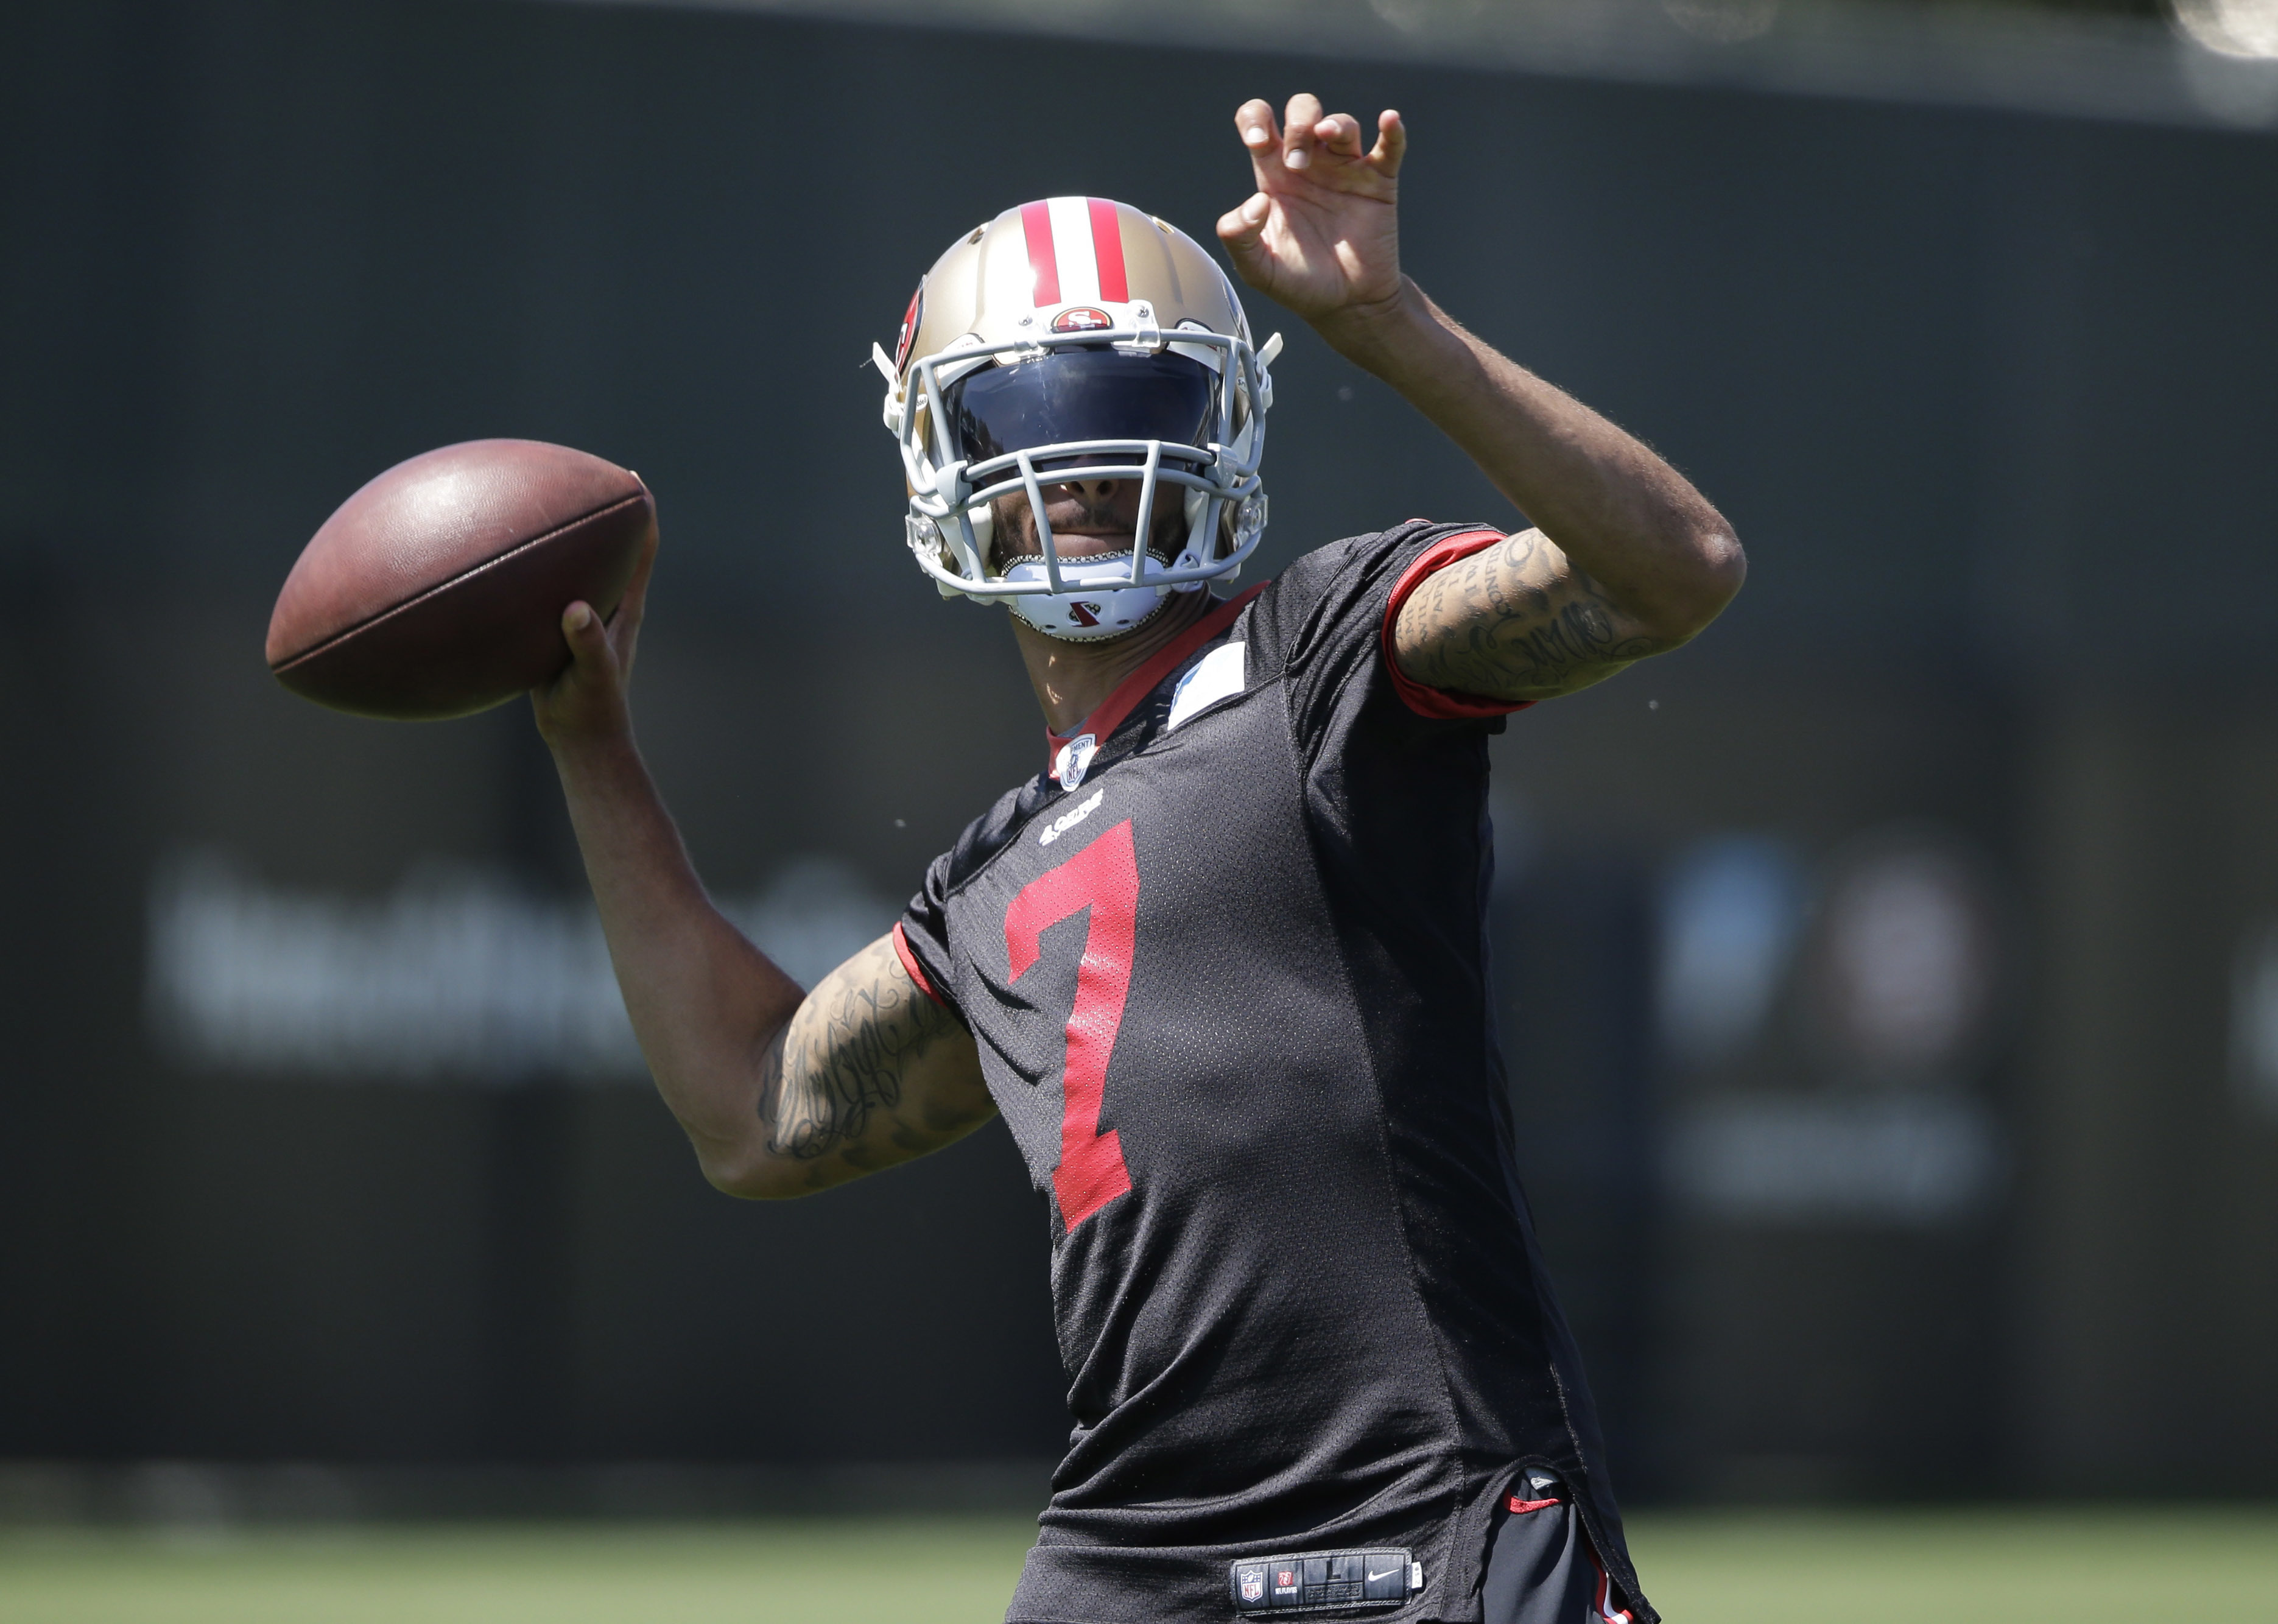 San Francisco 49ers quarterback Colin Kaepernick (7) throws during an NFL football practice Tuesday, June 7, 2016, in Santa Clara, Calif. (AP Photo/Marcio Jose Sanchez)